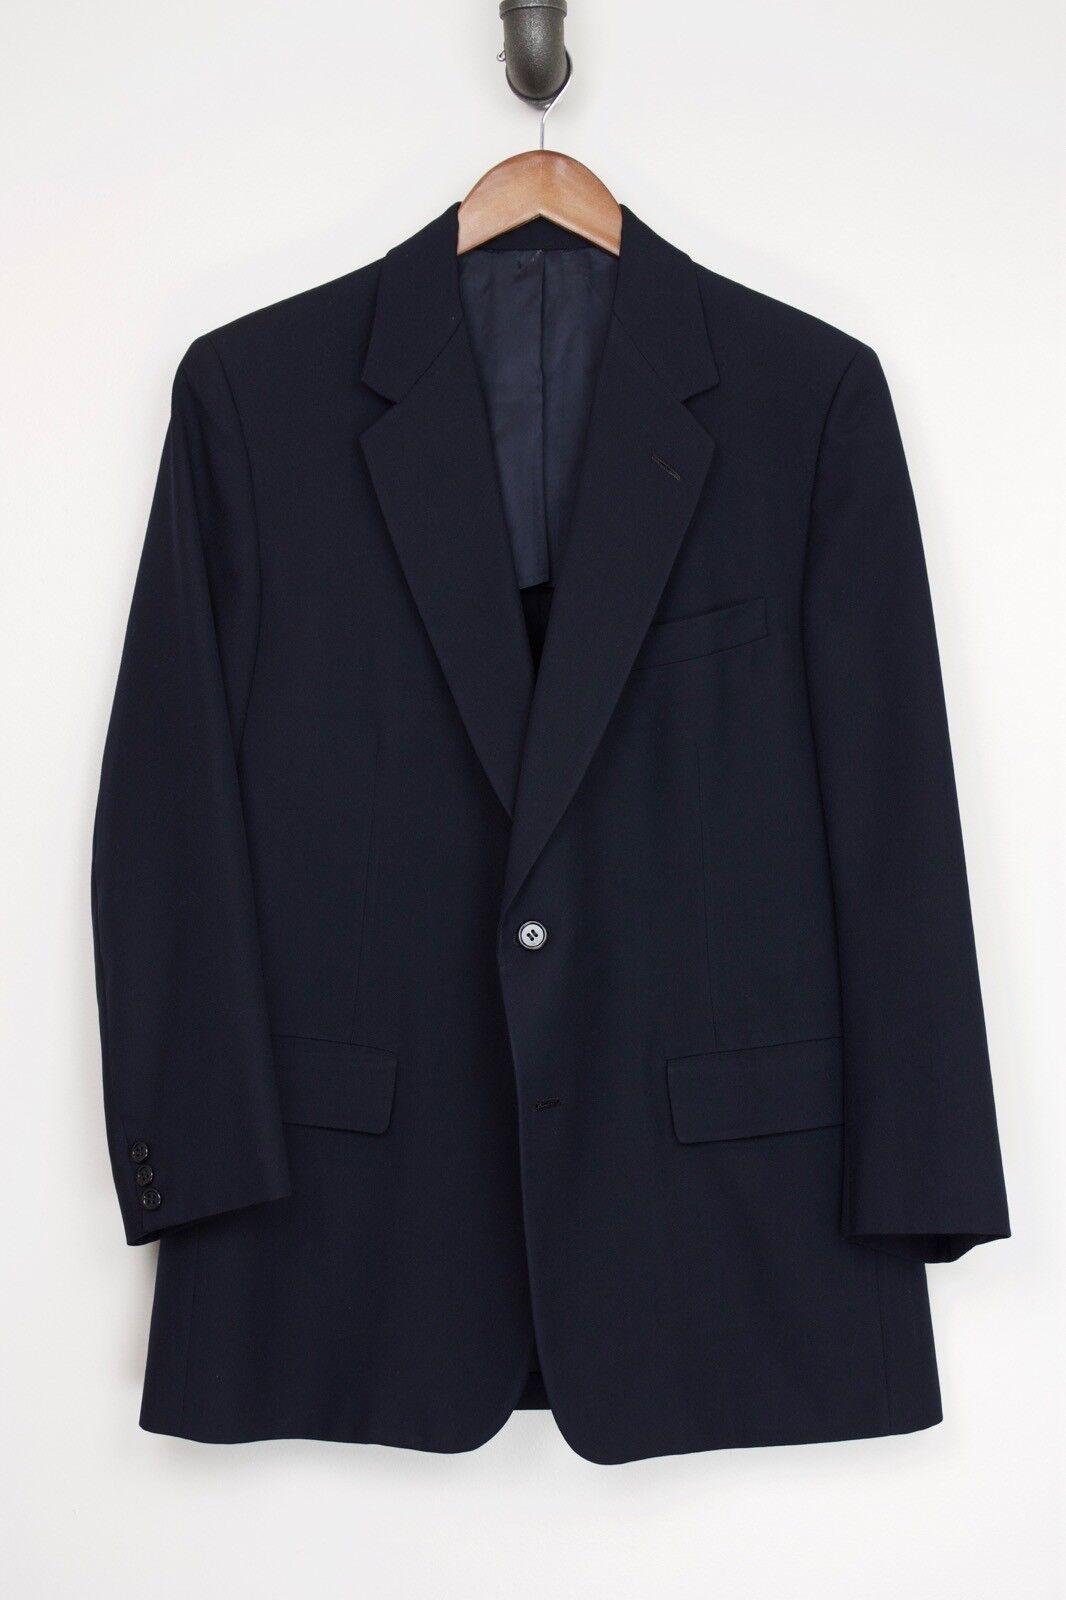 Hickey Freeman Herren Anzug 44R 39x28 Solides Marineblau Wolljacke Plissiert